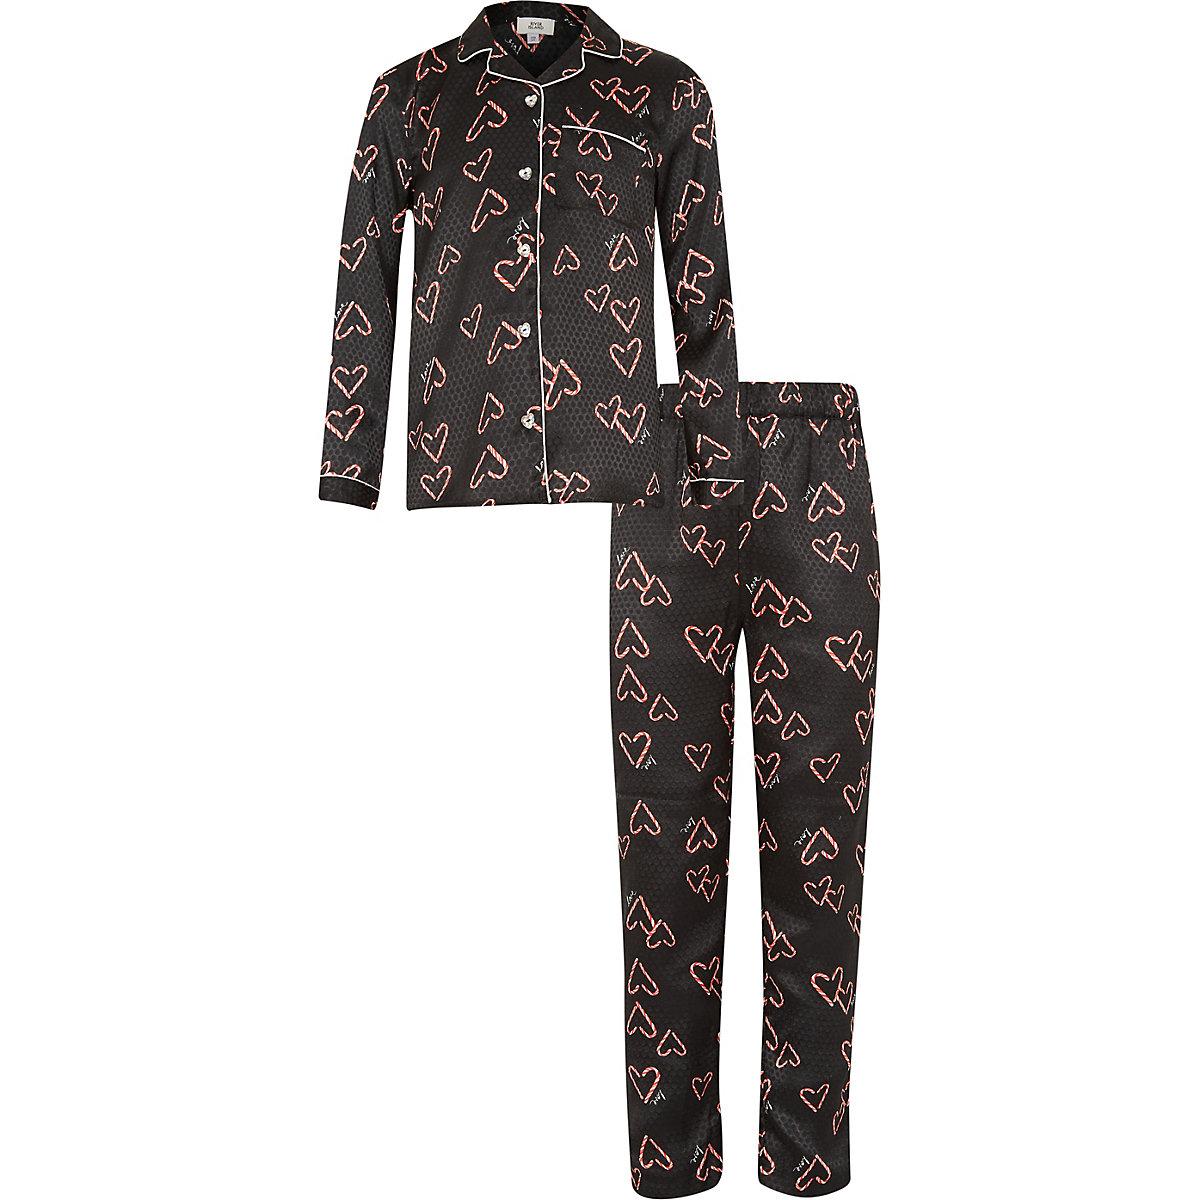 Girls black heart print pyjama set